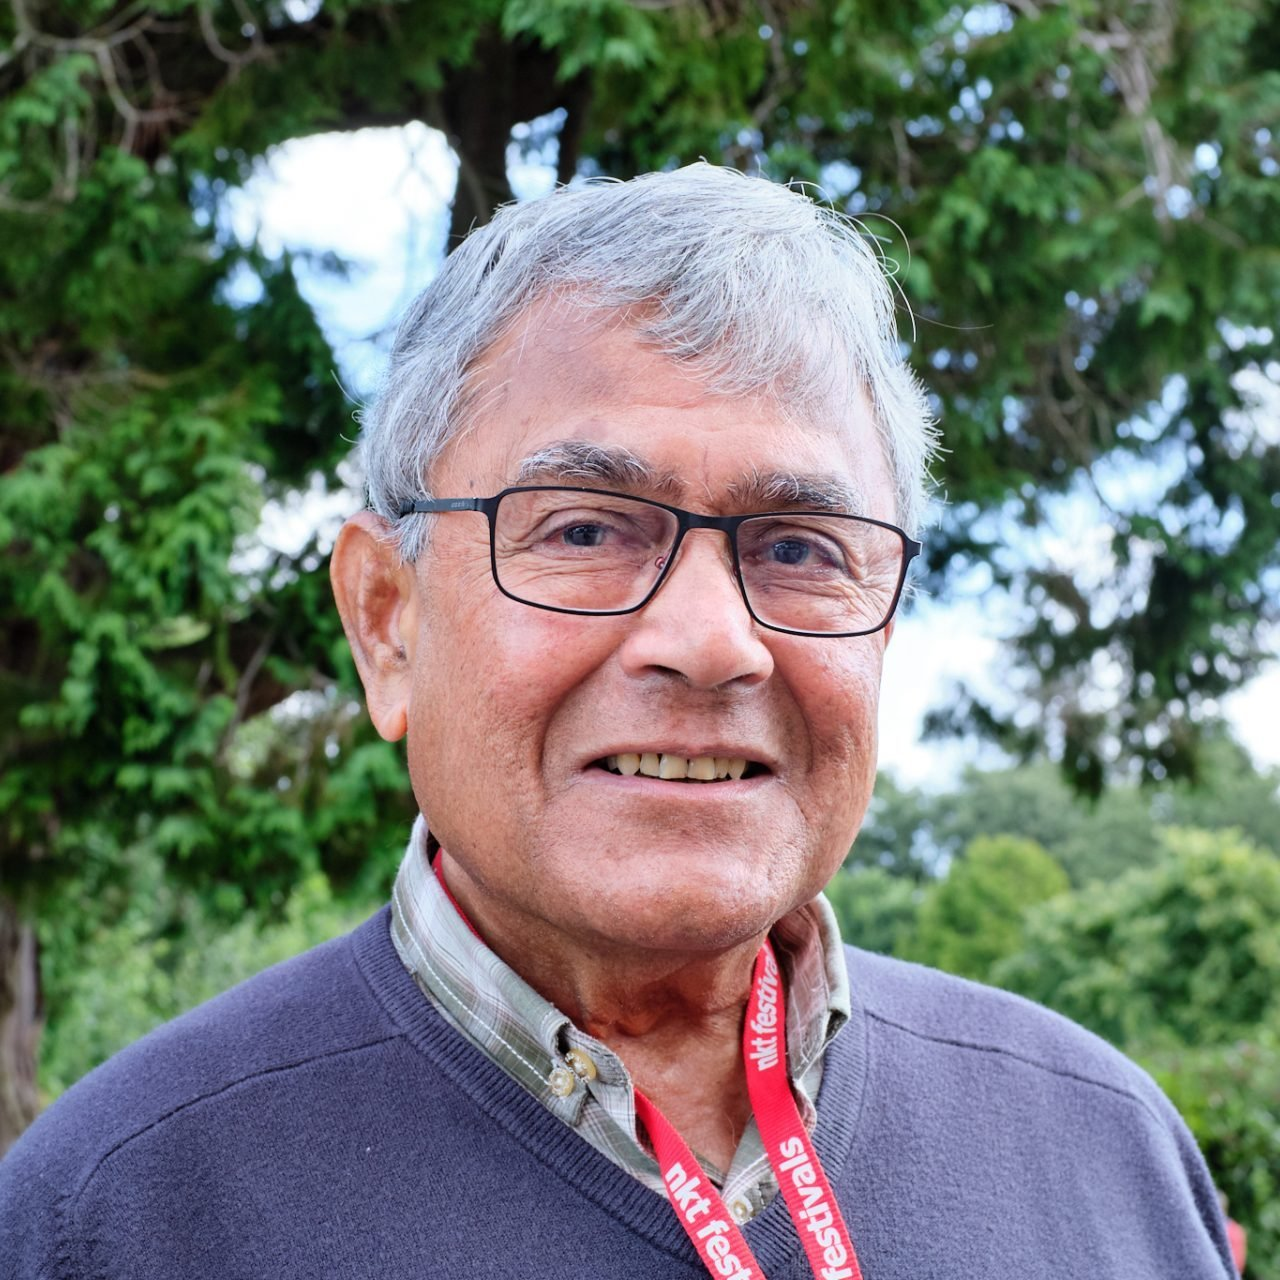 Santuo-ChatterjeeROB18250_interviews